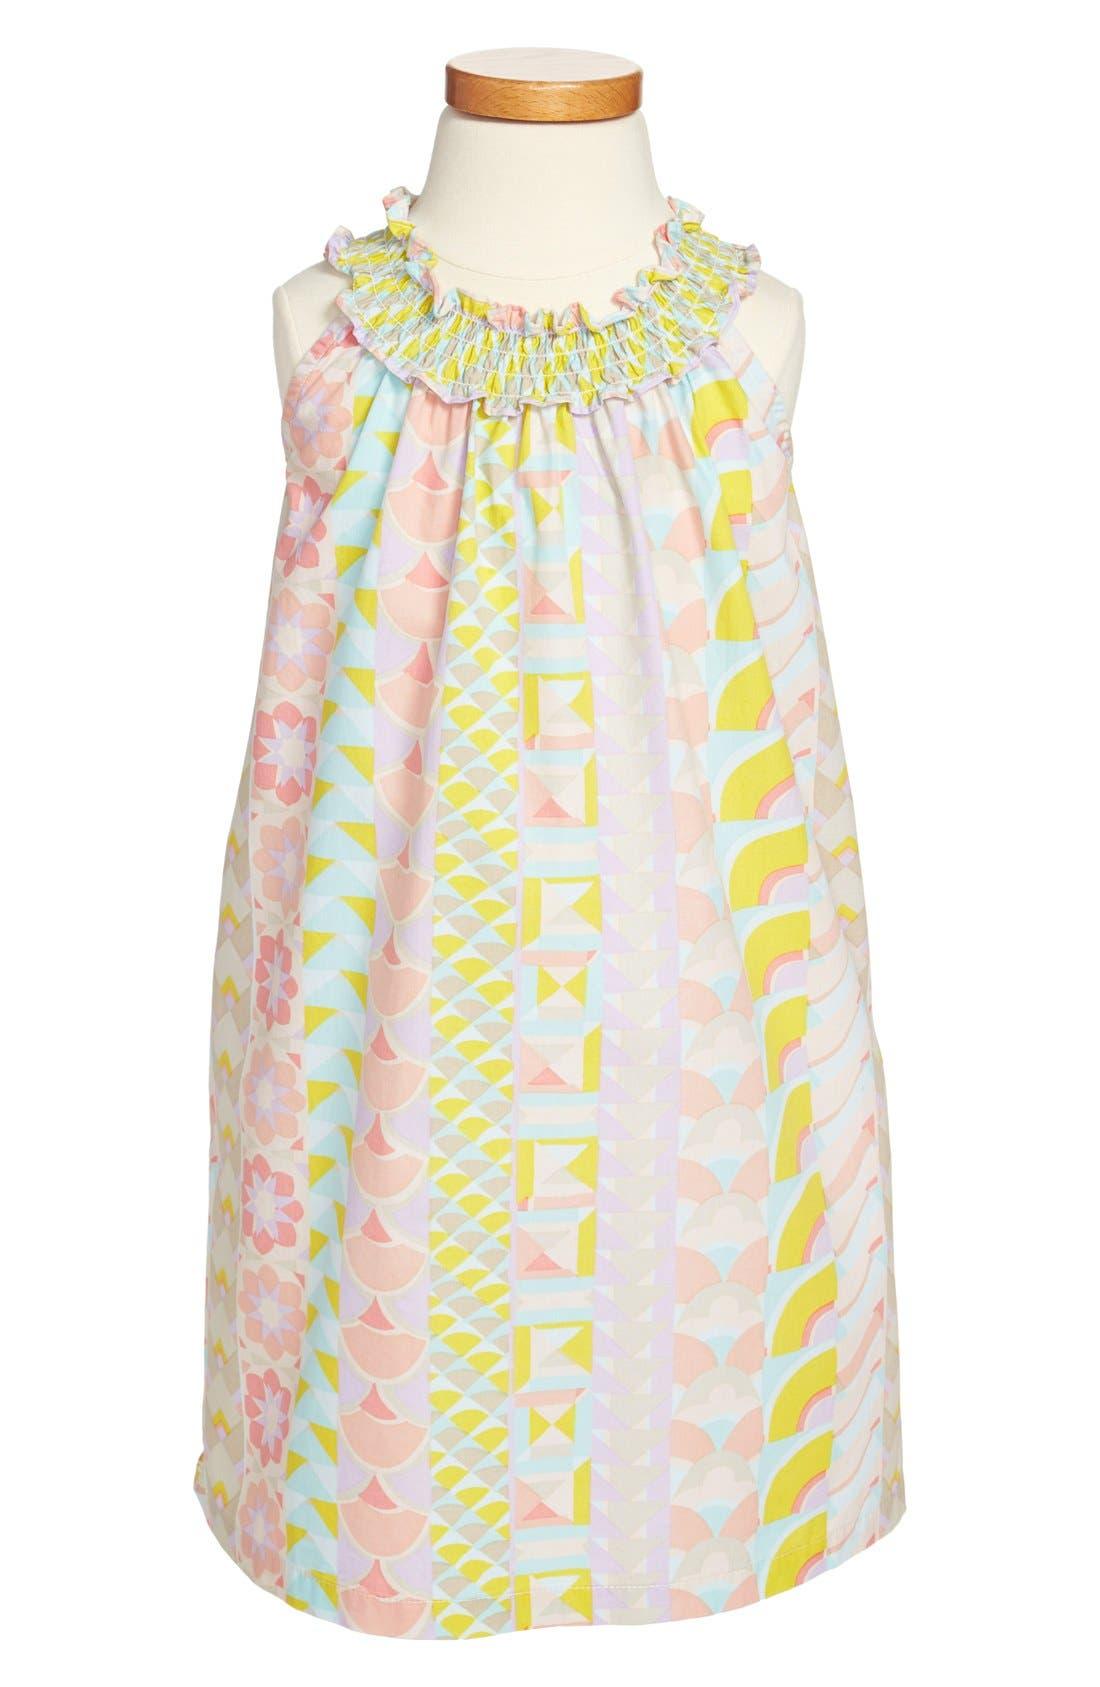 Main Image - Tea Collection 'La Mamounia' Halter Dress (Little Girls & Big Girls)